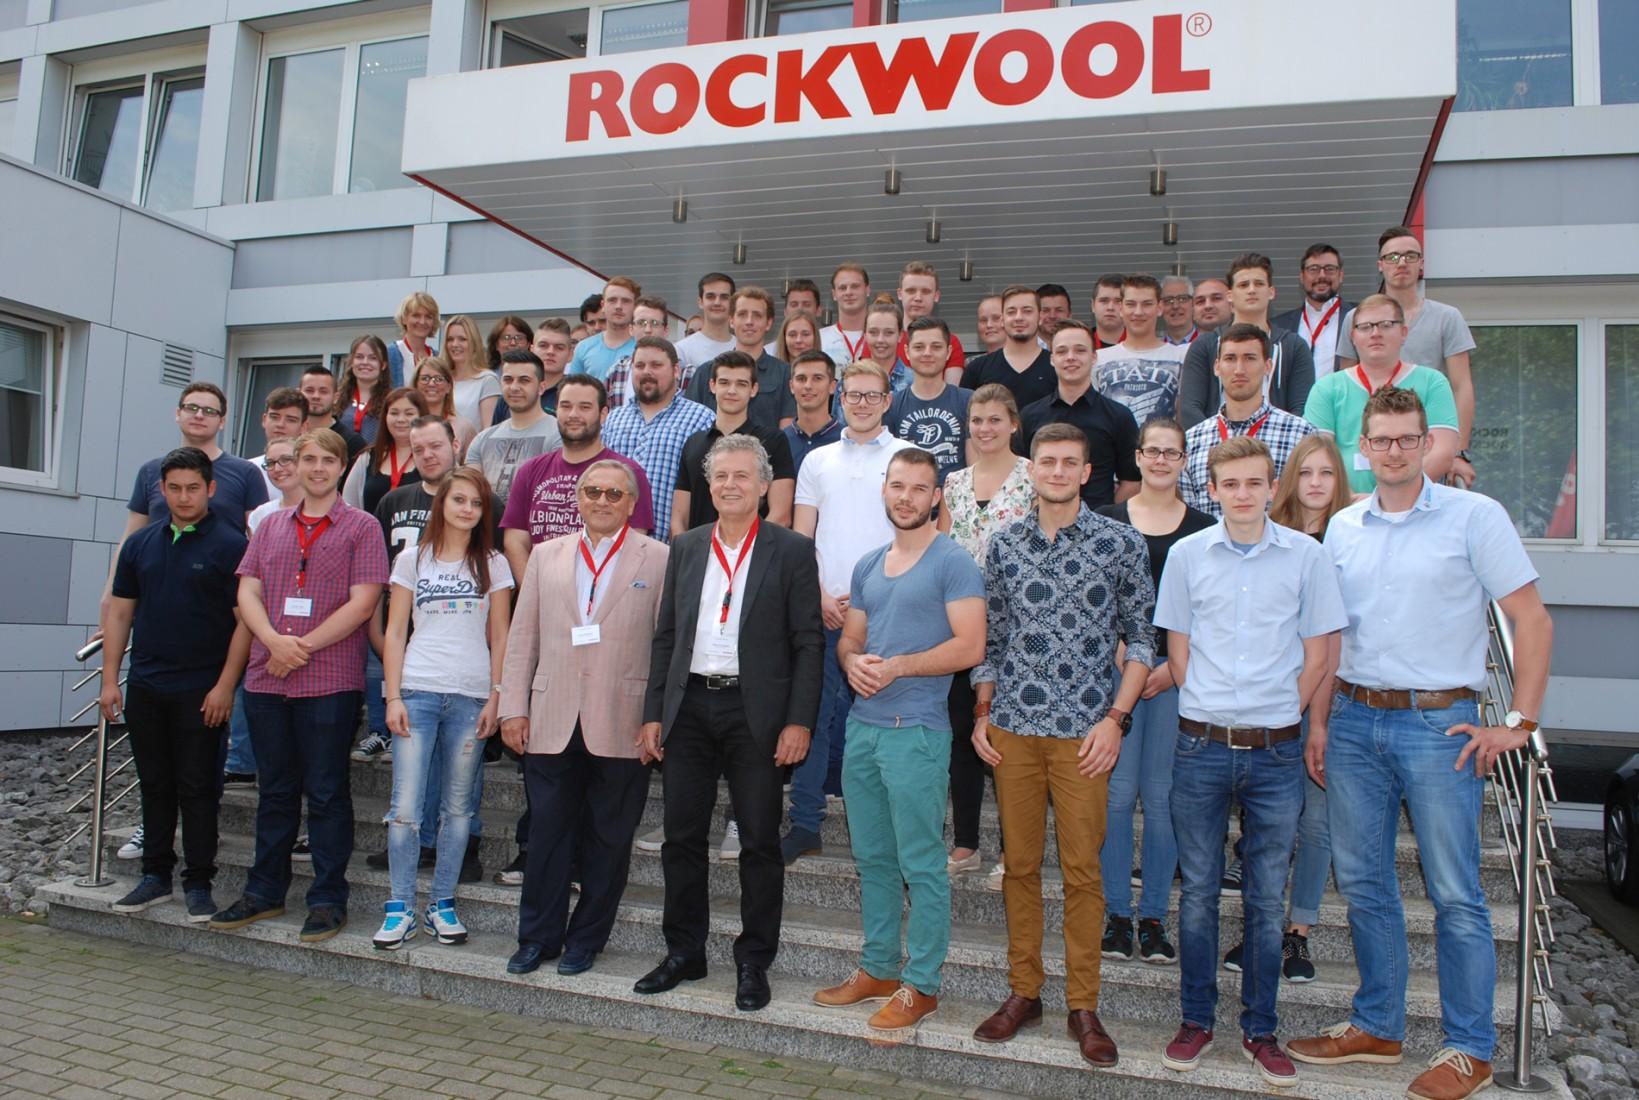 Azubi-Tag bei Rockwool: Knapp 60 Teilnehmer kamen nach Gladbeck